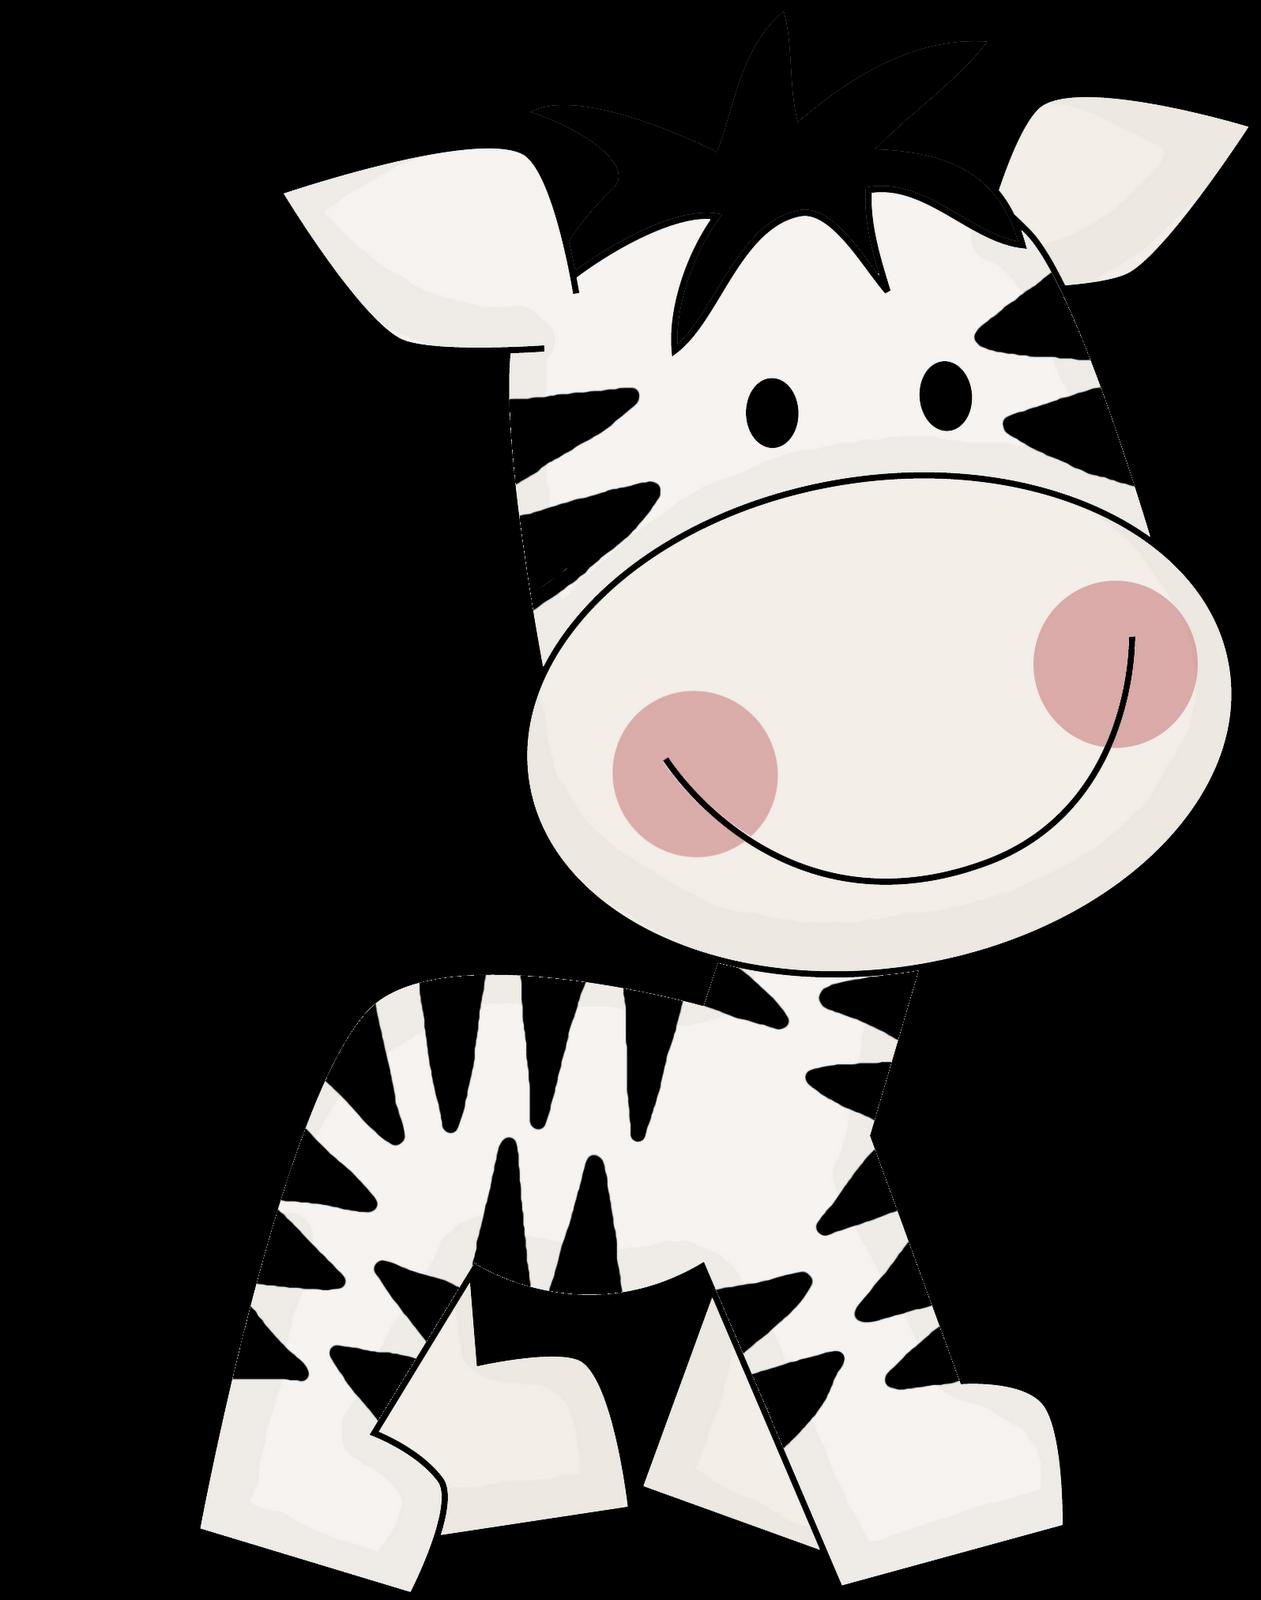 Turkey clipart simples image transparent stock cute zebra illustration - Google Search | KESE | Pinterest | Zebra ... image transparent stock